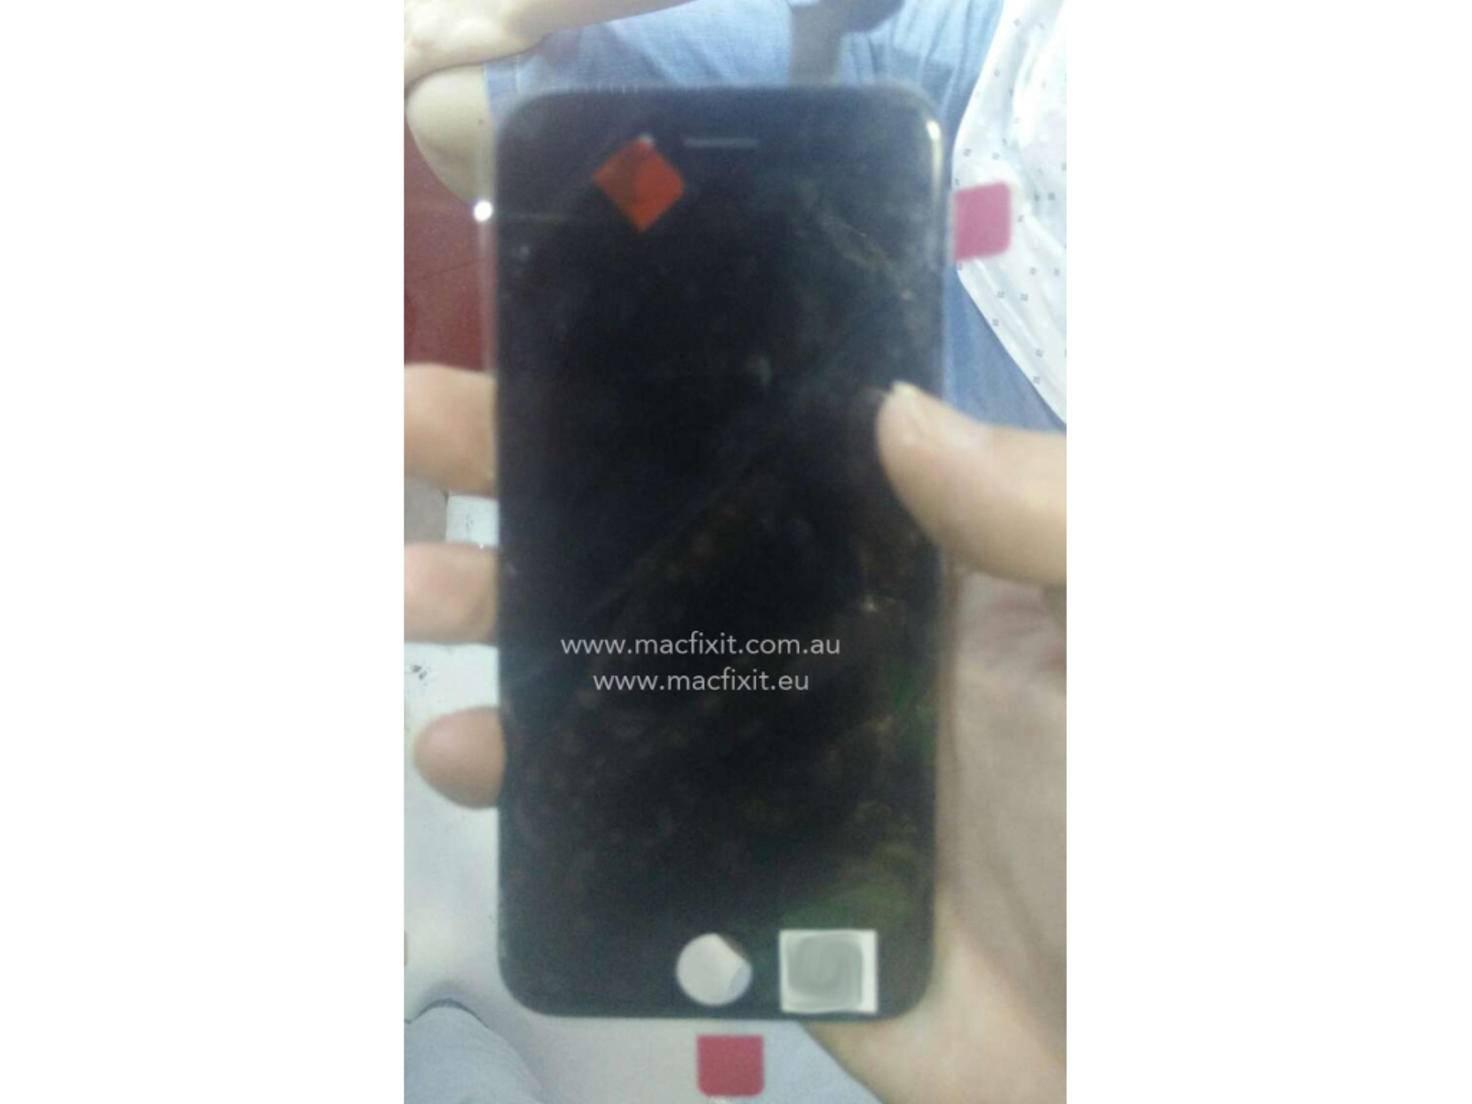 So soll das iPhone 6s aussehen.